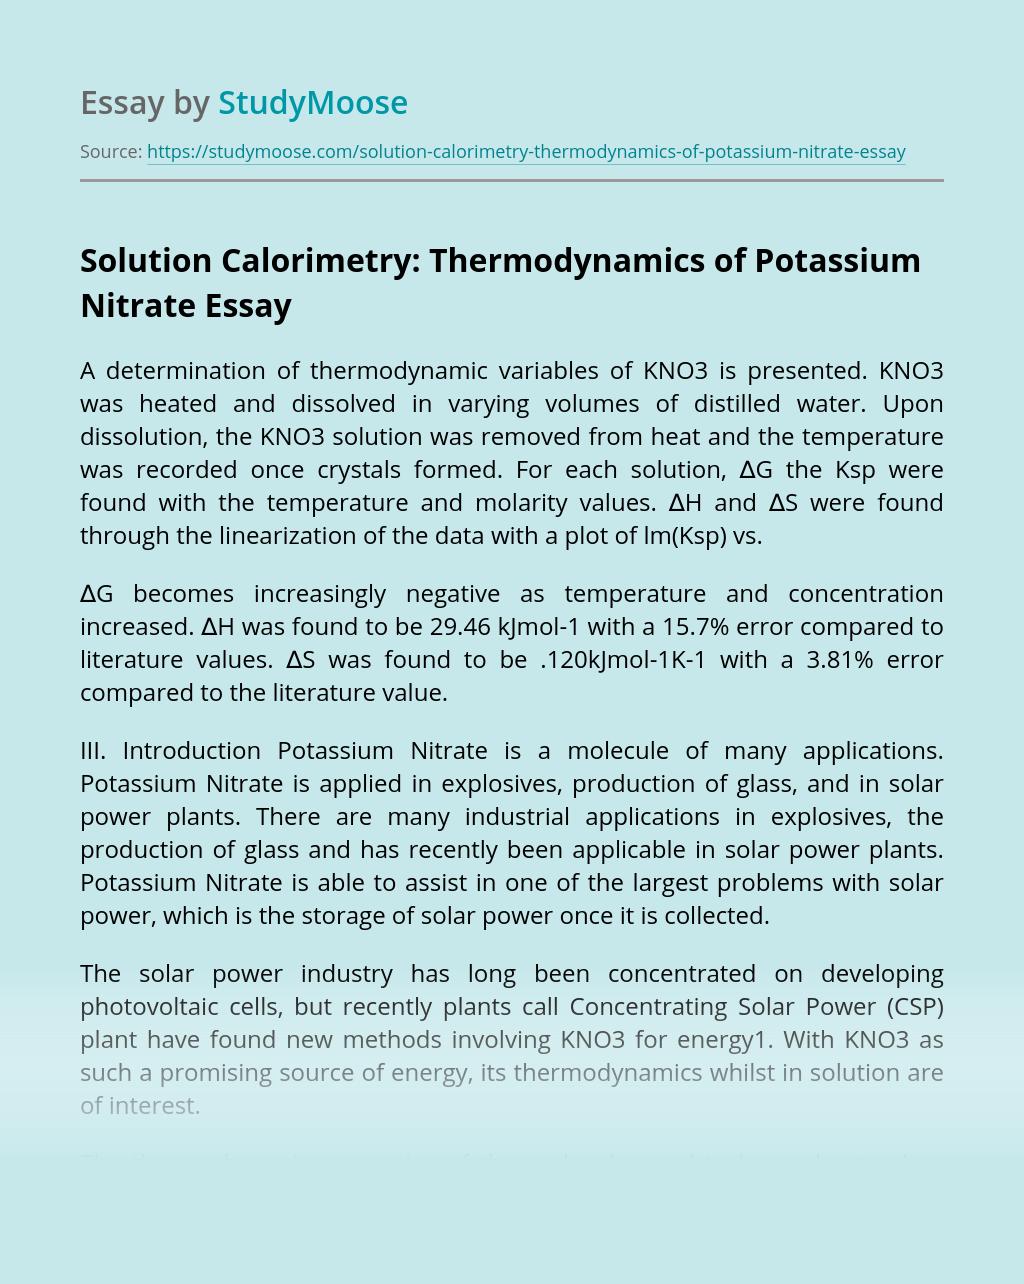 Solution Calorimetry: Thermodynamics of Potassium Nitrate